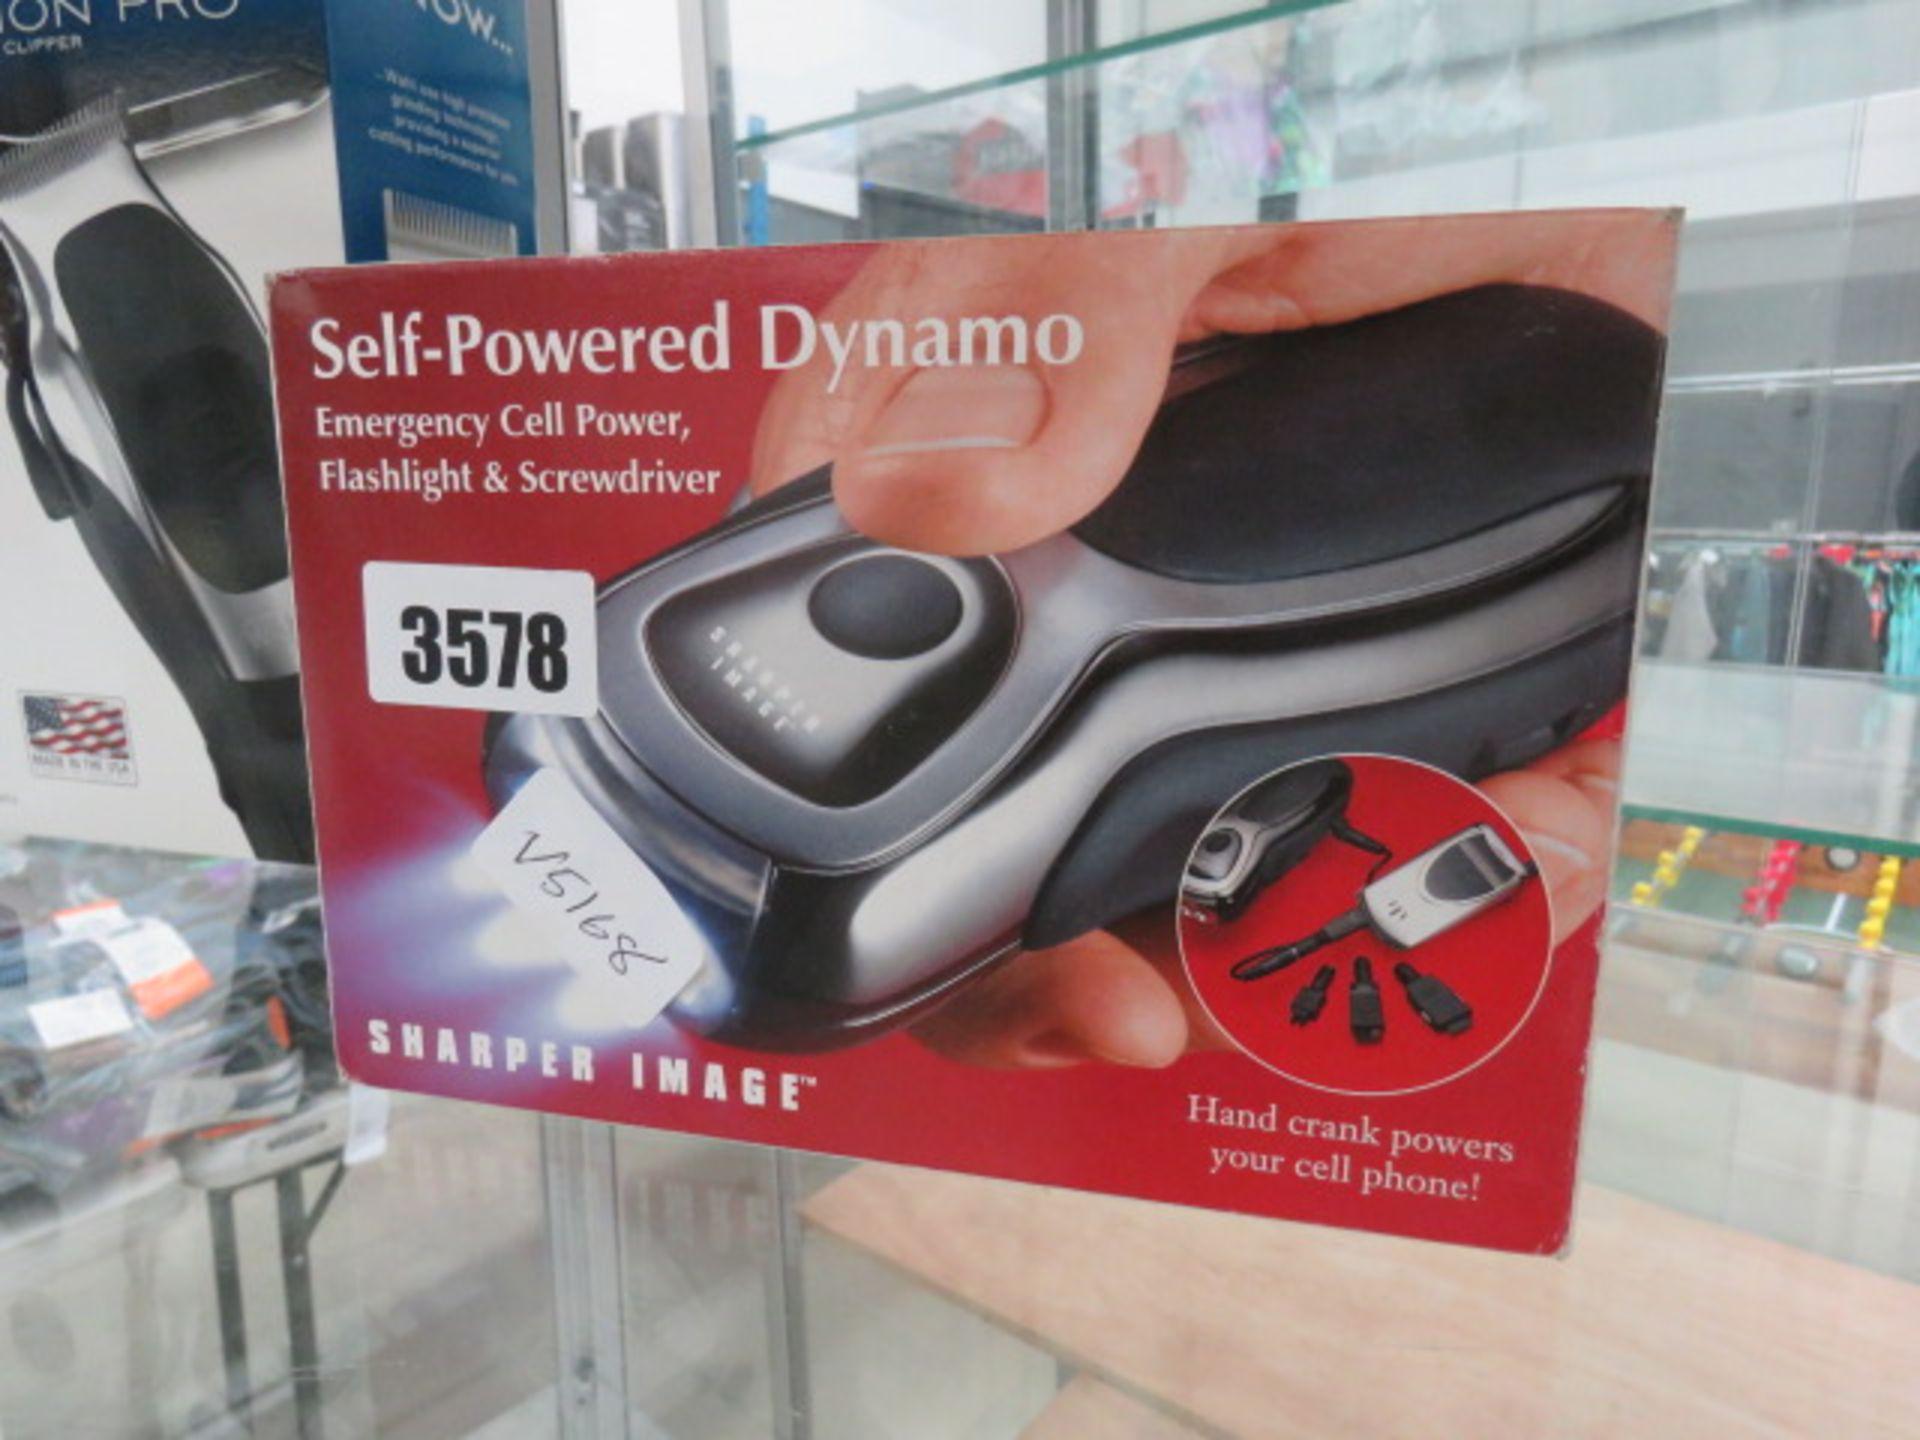 Lot 3578 - Self powered Dynamo flash light and screwdriver set